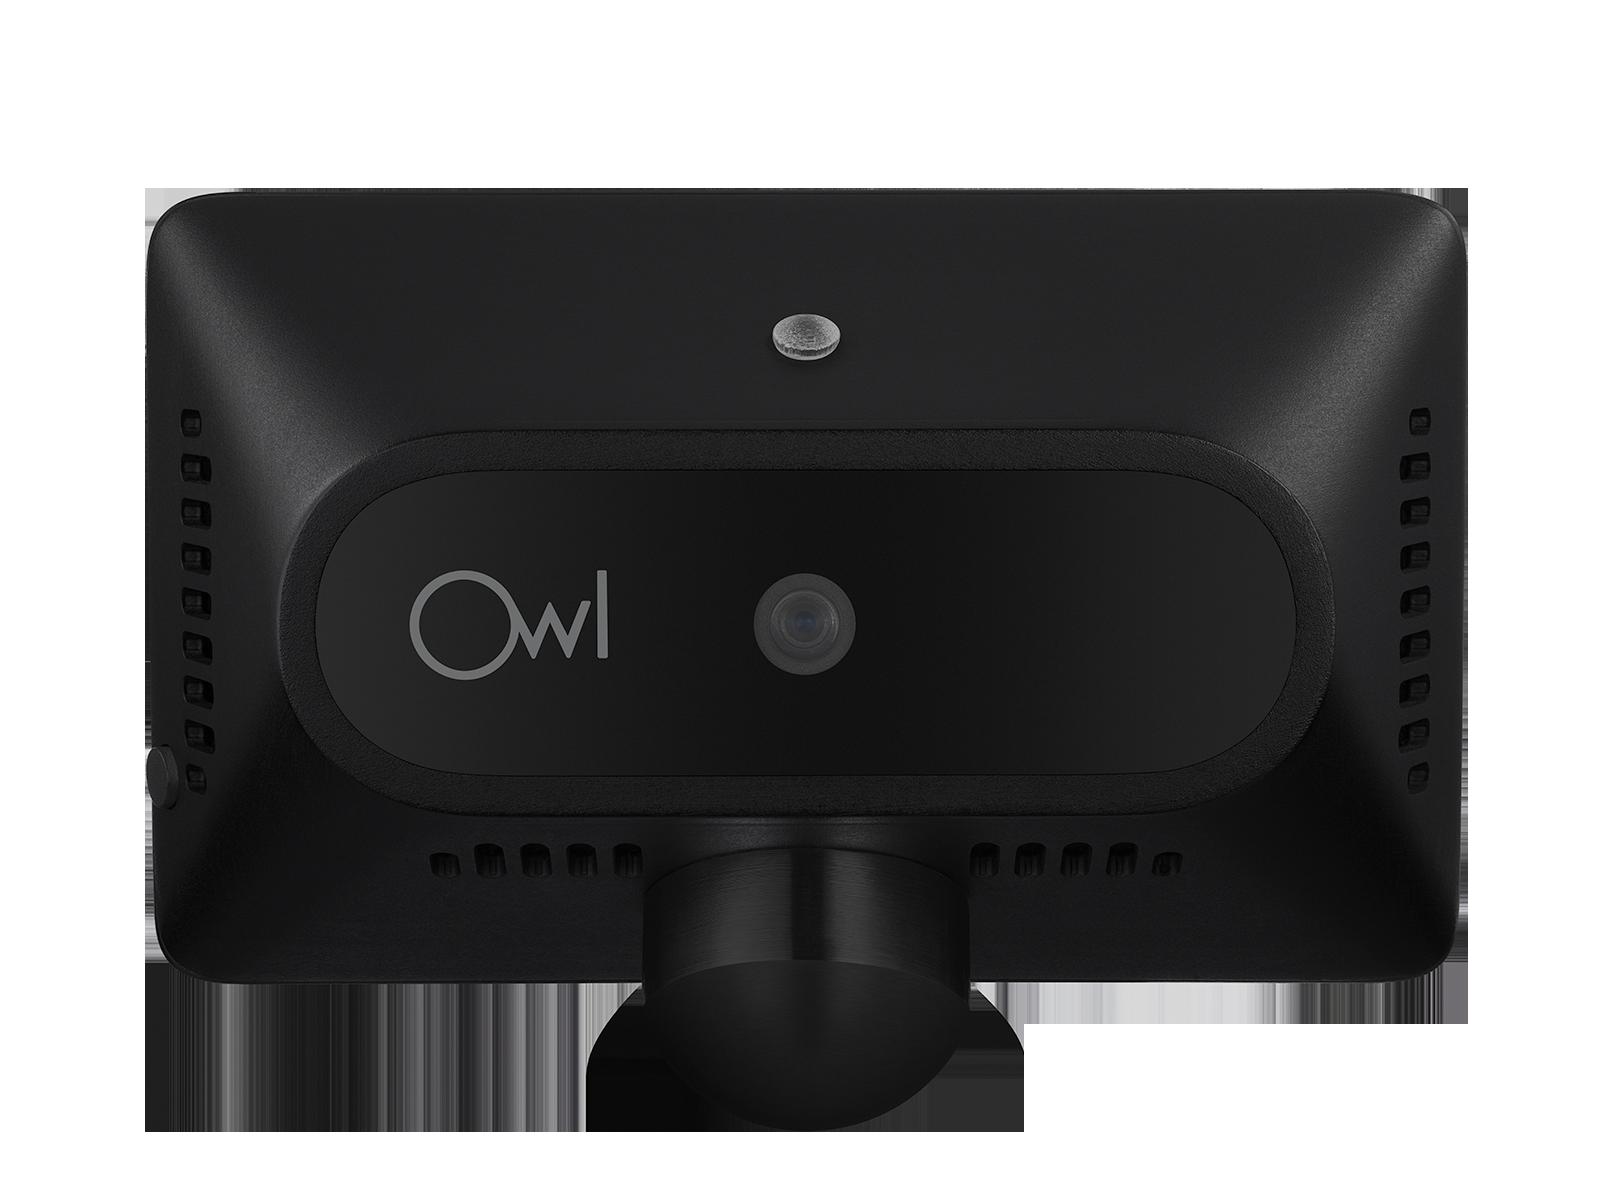 Car lights clipart vector transparent stock Owl Car Cam Review: The Dashcam to Go For If You Give a Hoot About ... vector transparent stock